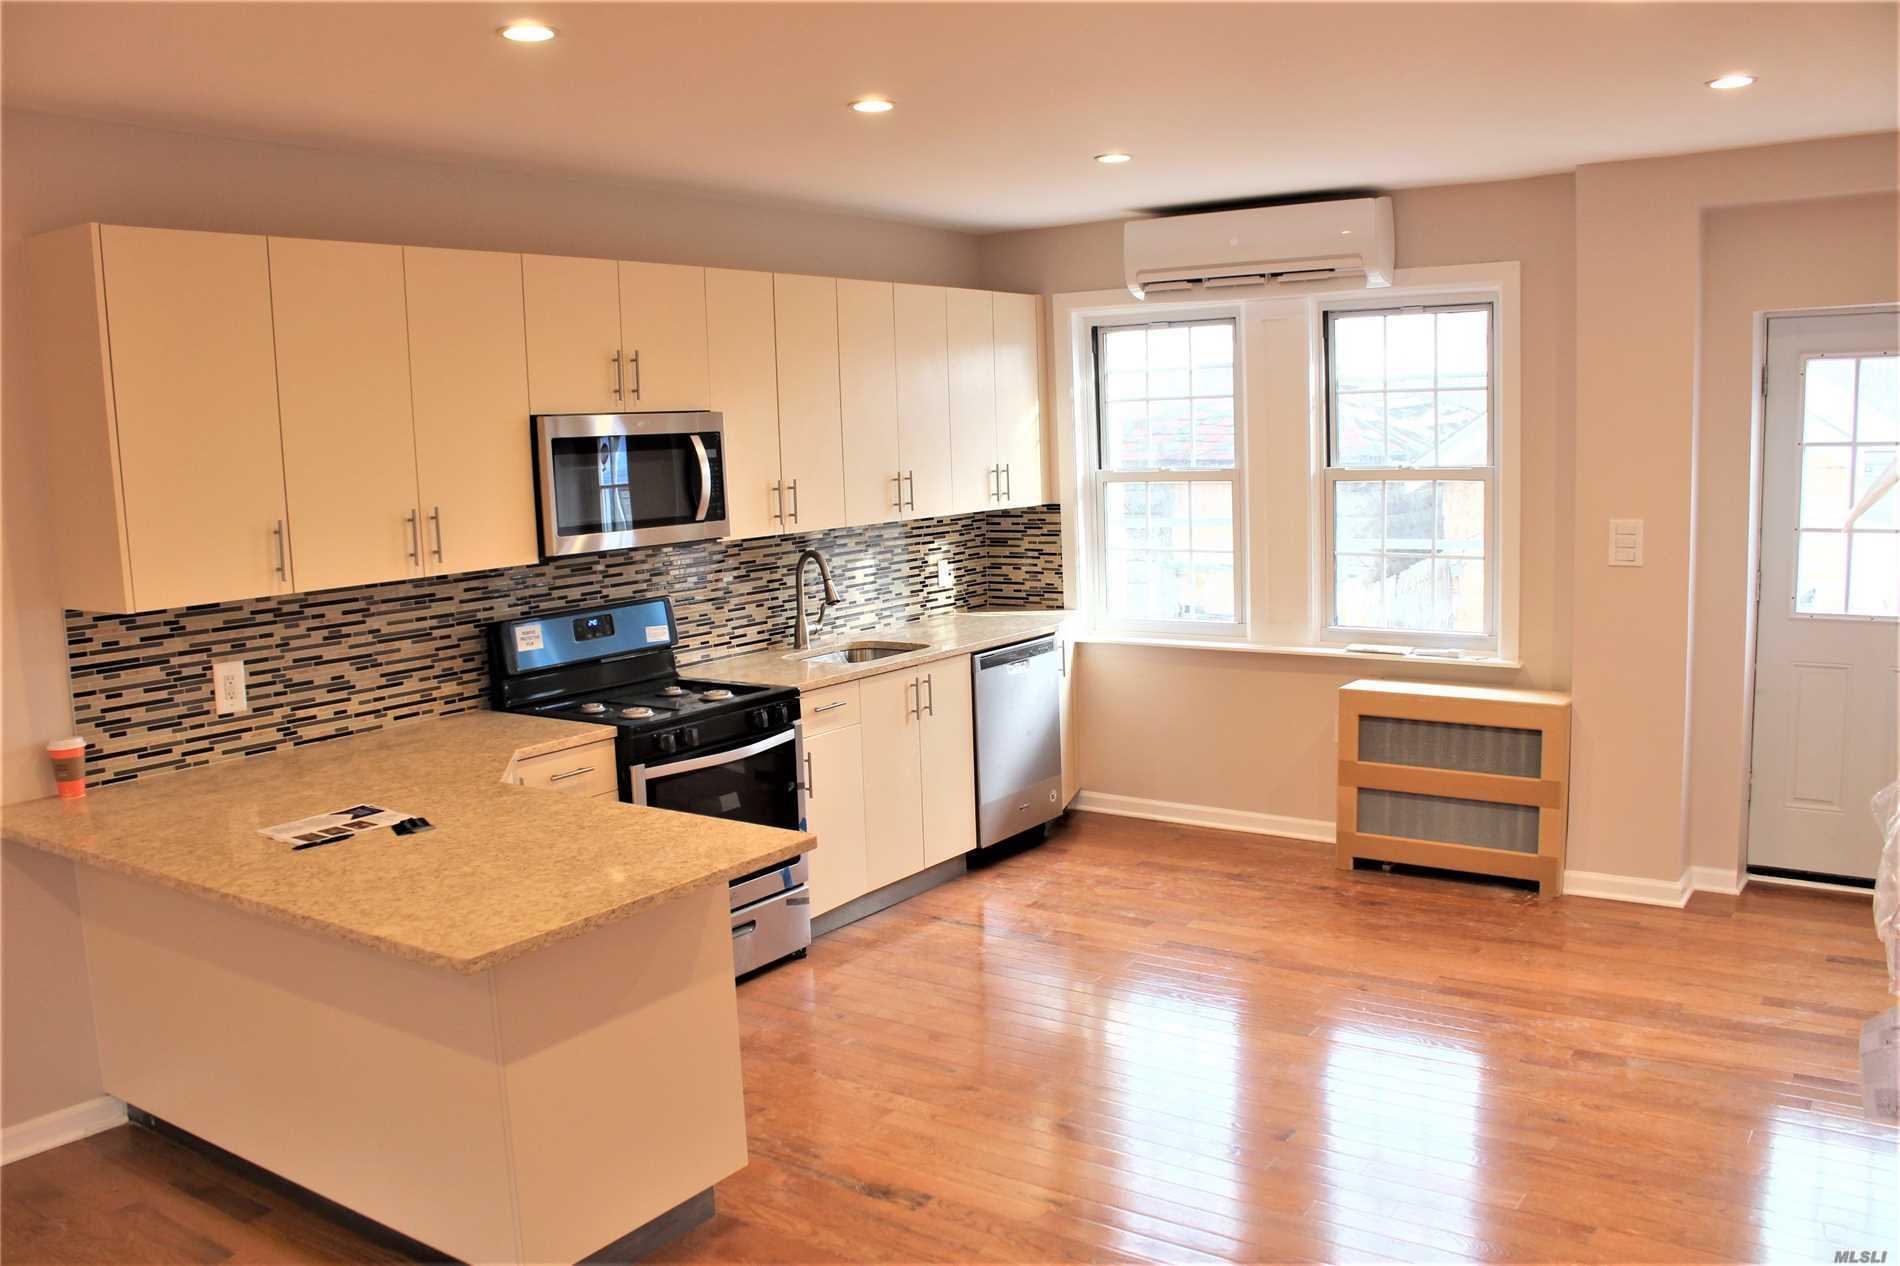 205-16 118th Ave Cambria Heights, NY 11411